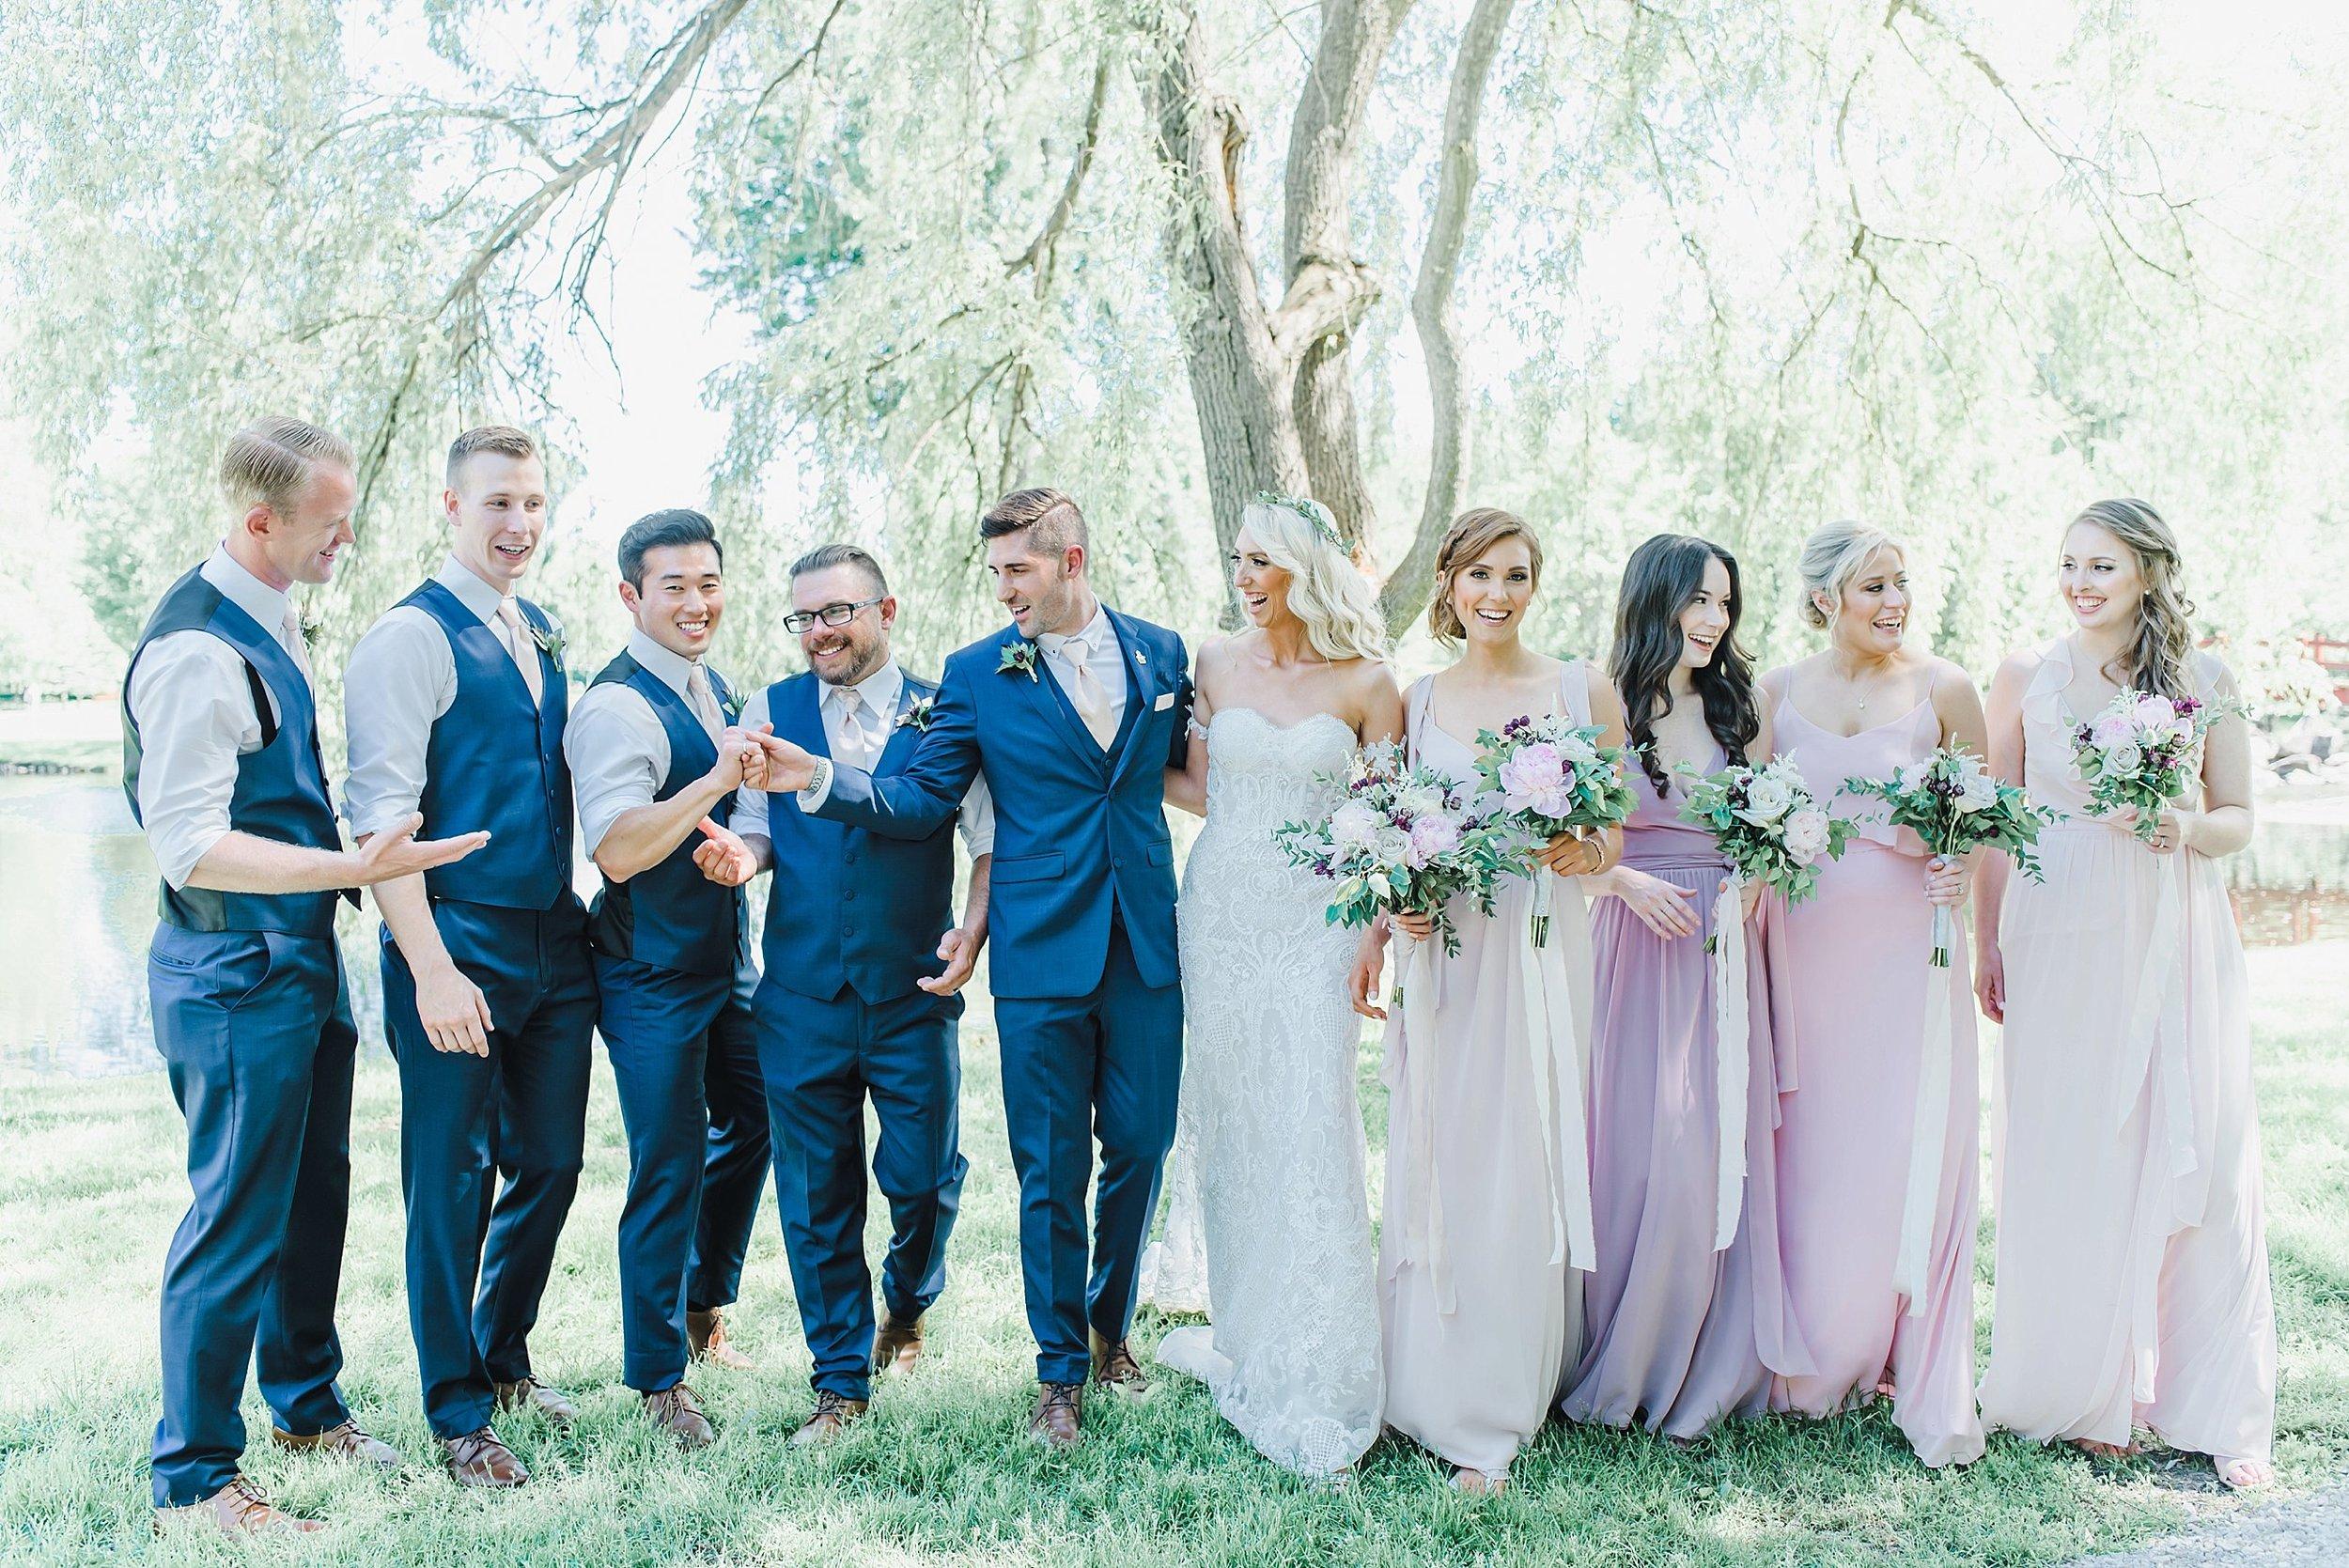 light airy indie fine art ottawa wedding photographer | Ali and Batoul Photography_0056.jpg